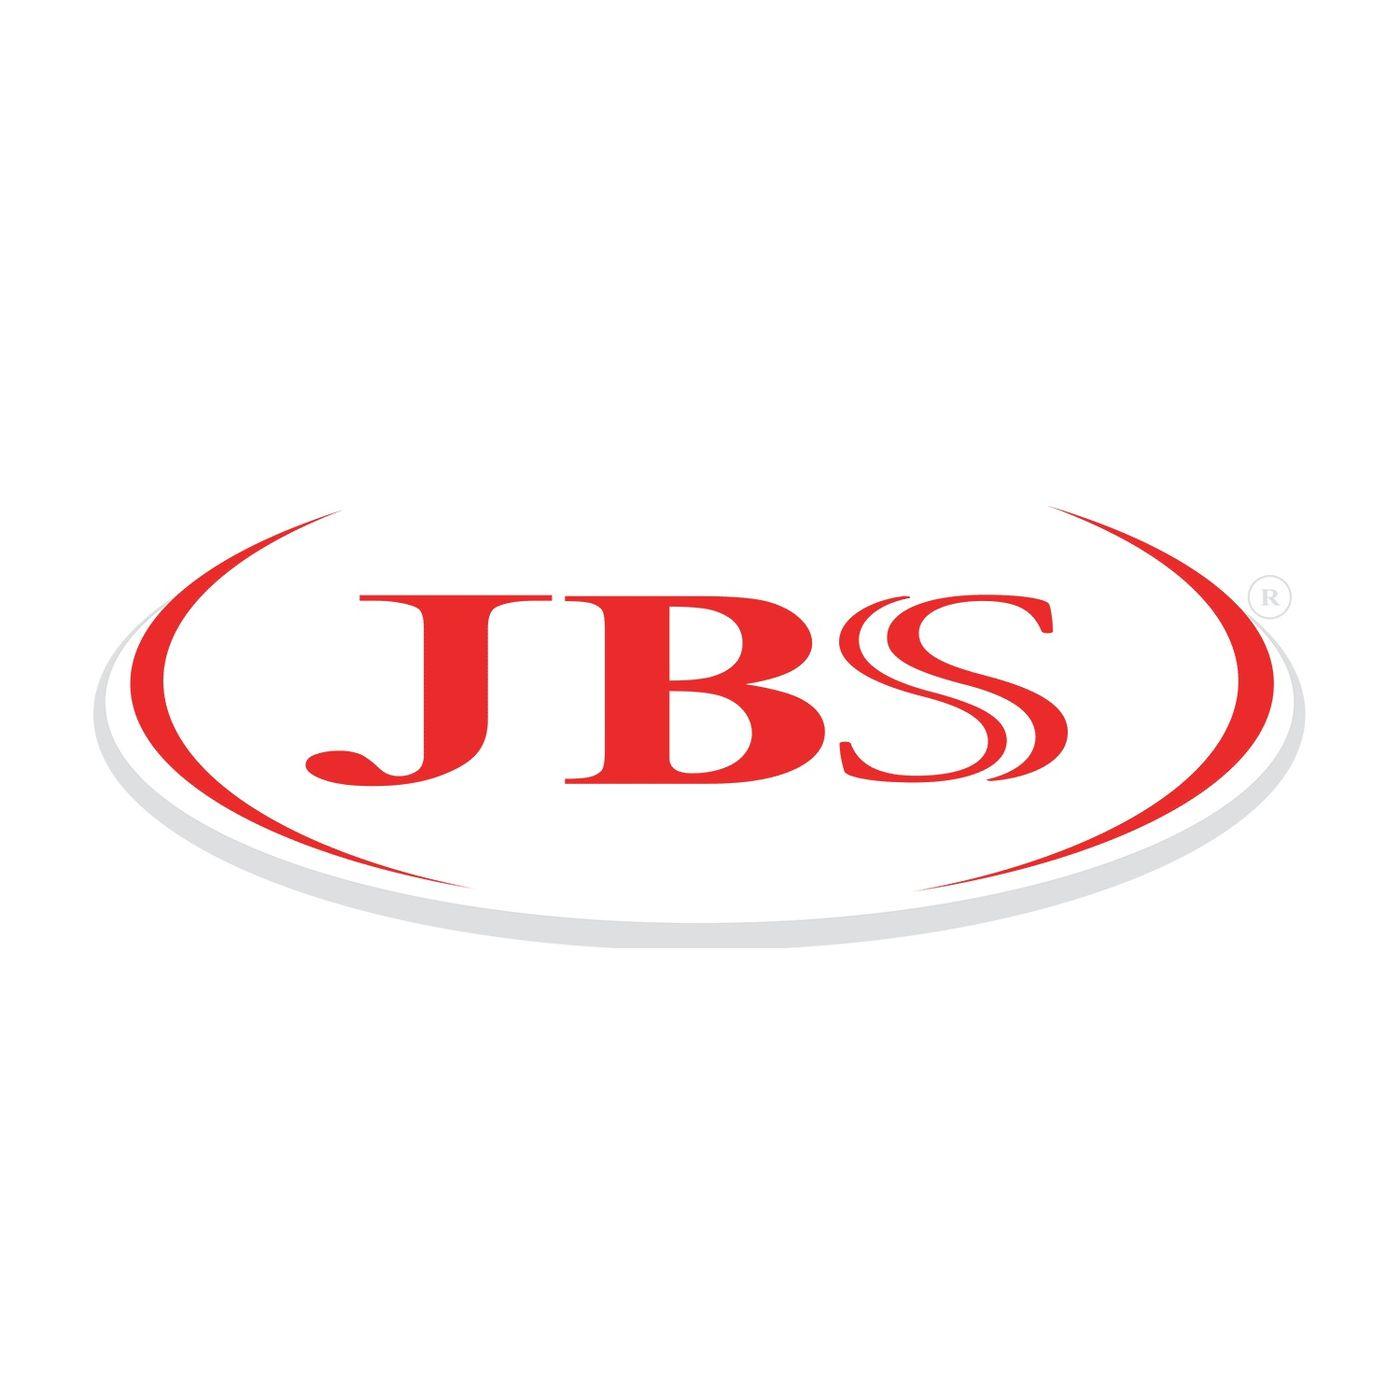 Teleconferência do Resultado JBS (JBSS3) 4 trimestre 2019 - 4t19